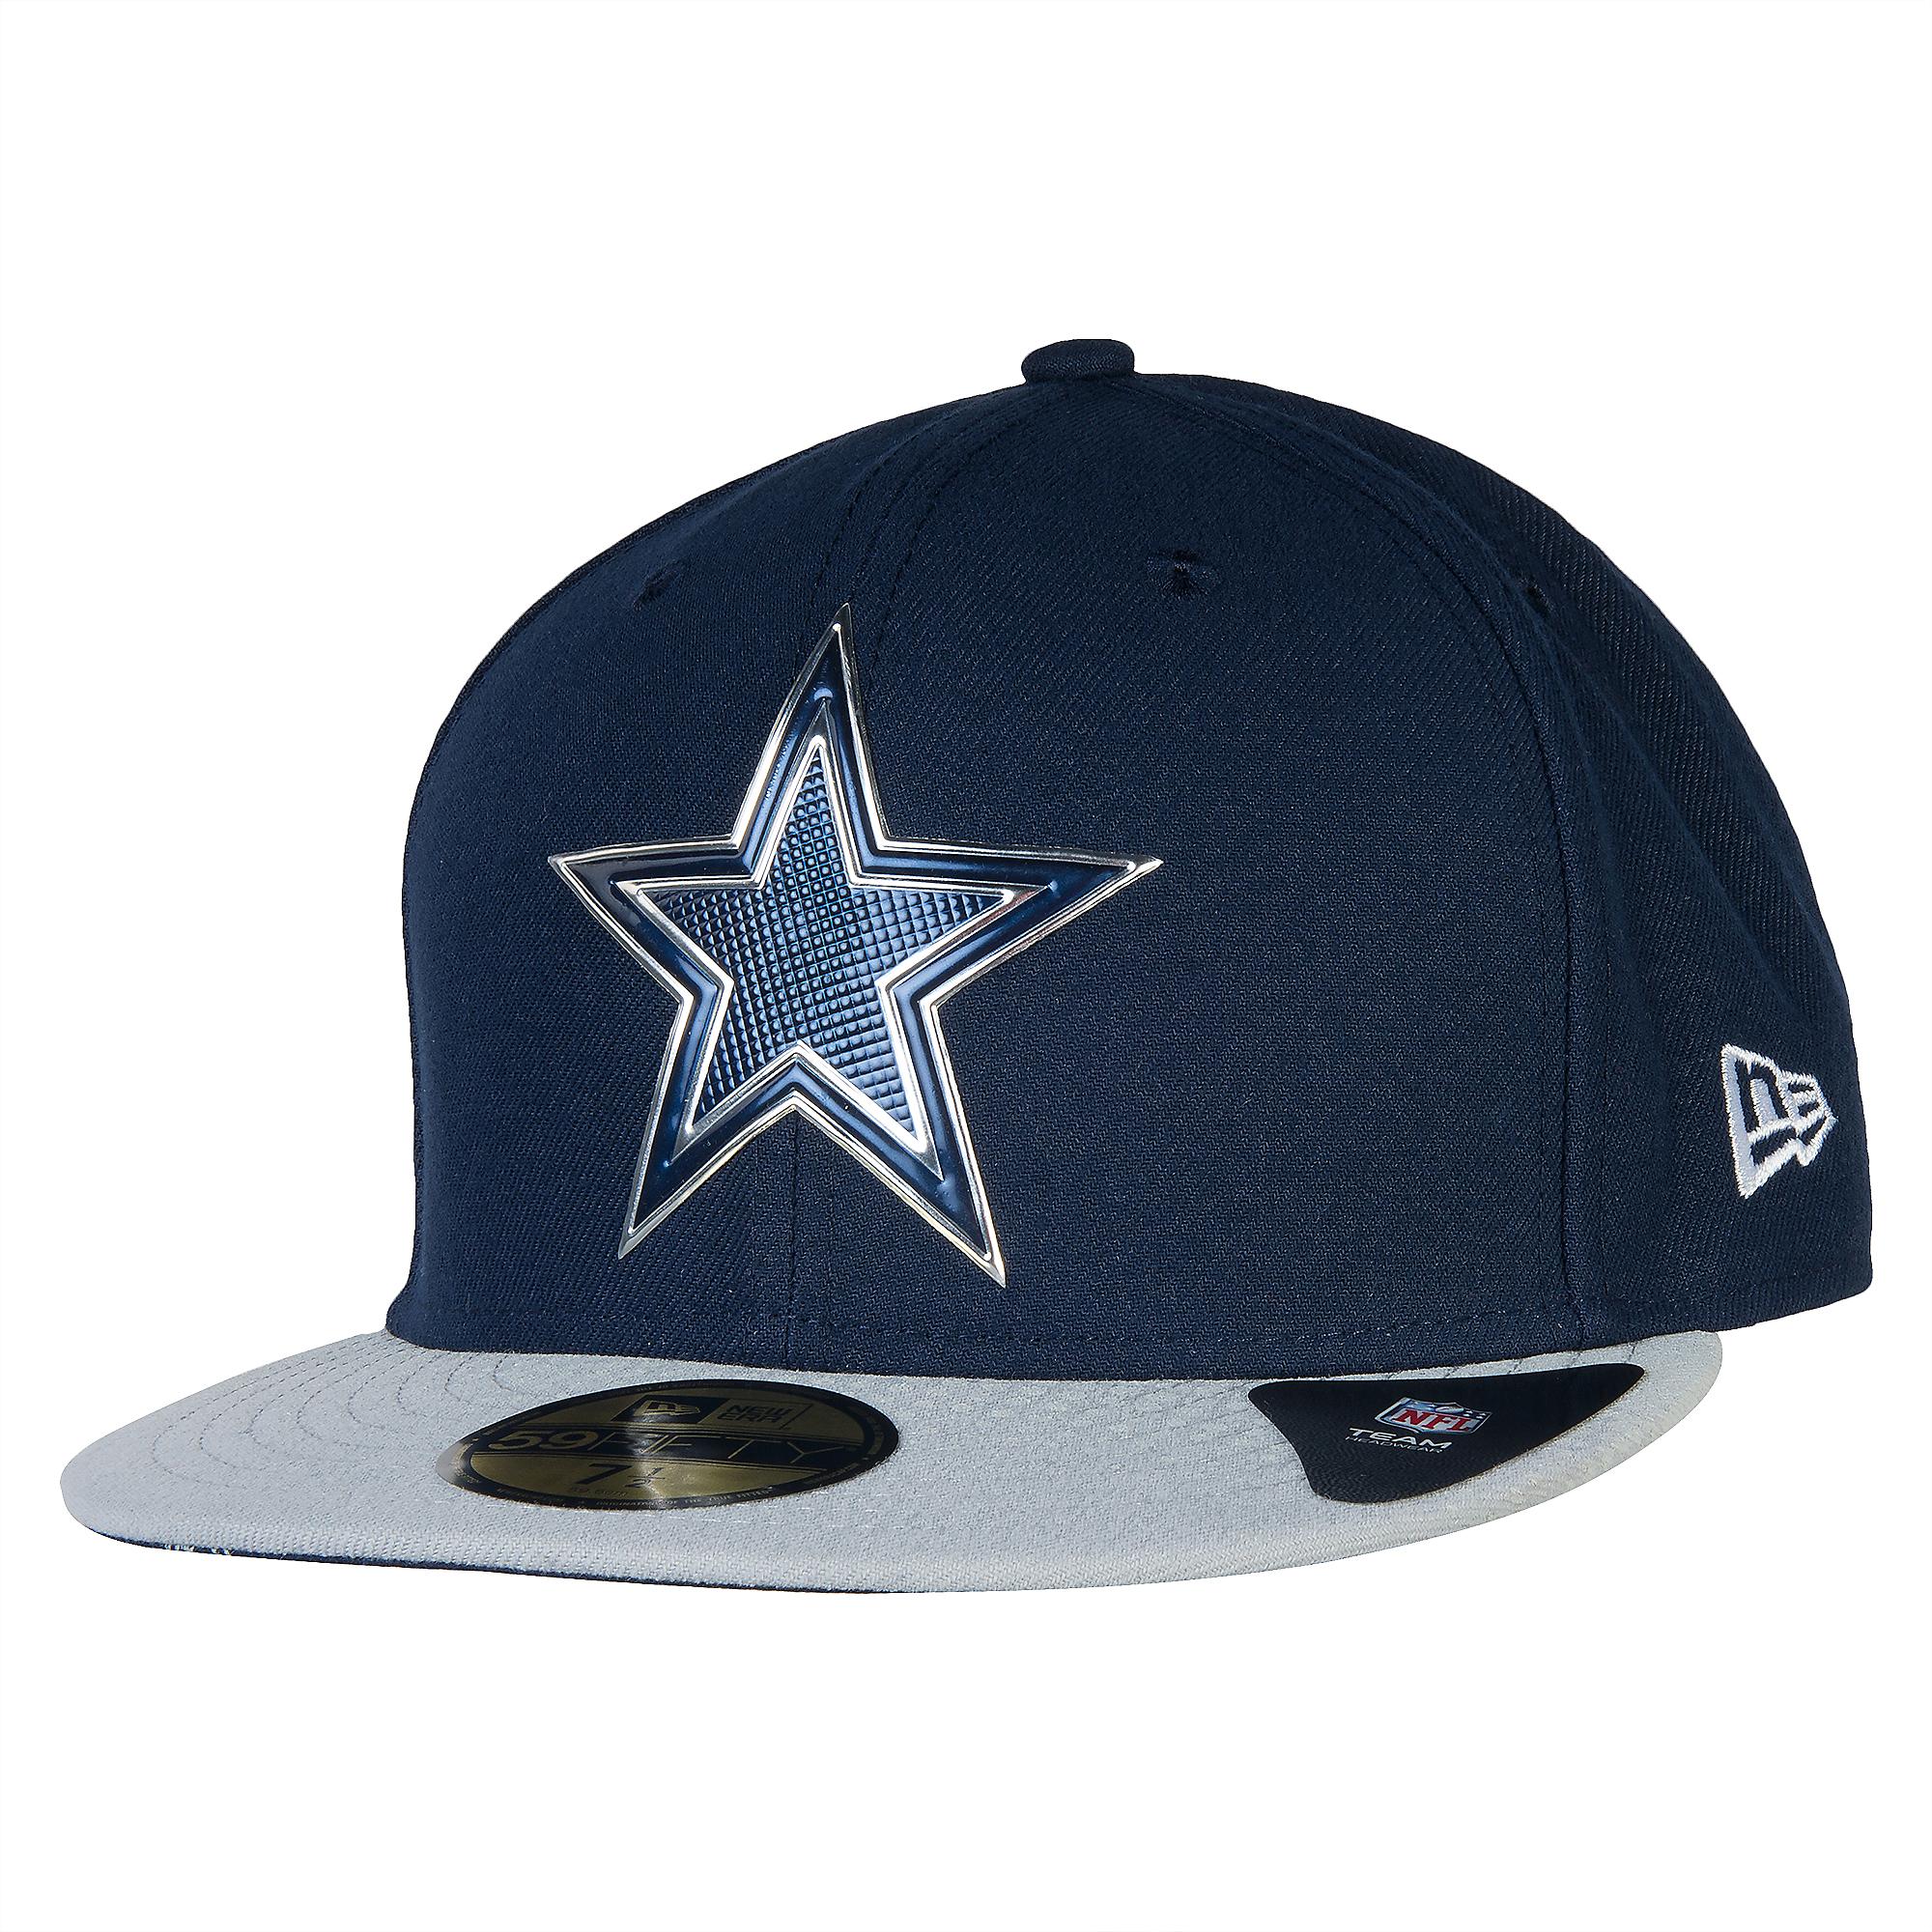 Dallas Cowboys New Era 2015 Onstage Draft 59Fifty Cap  cc8706bb0b7